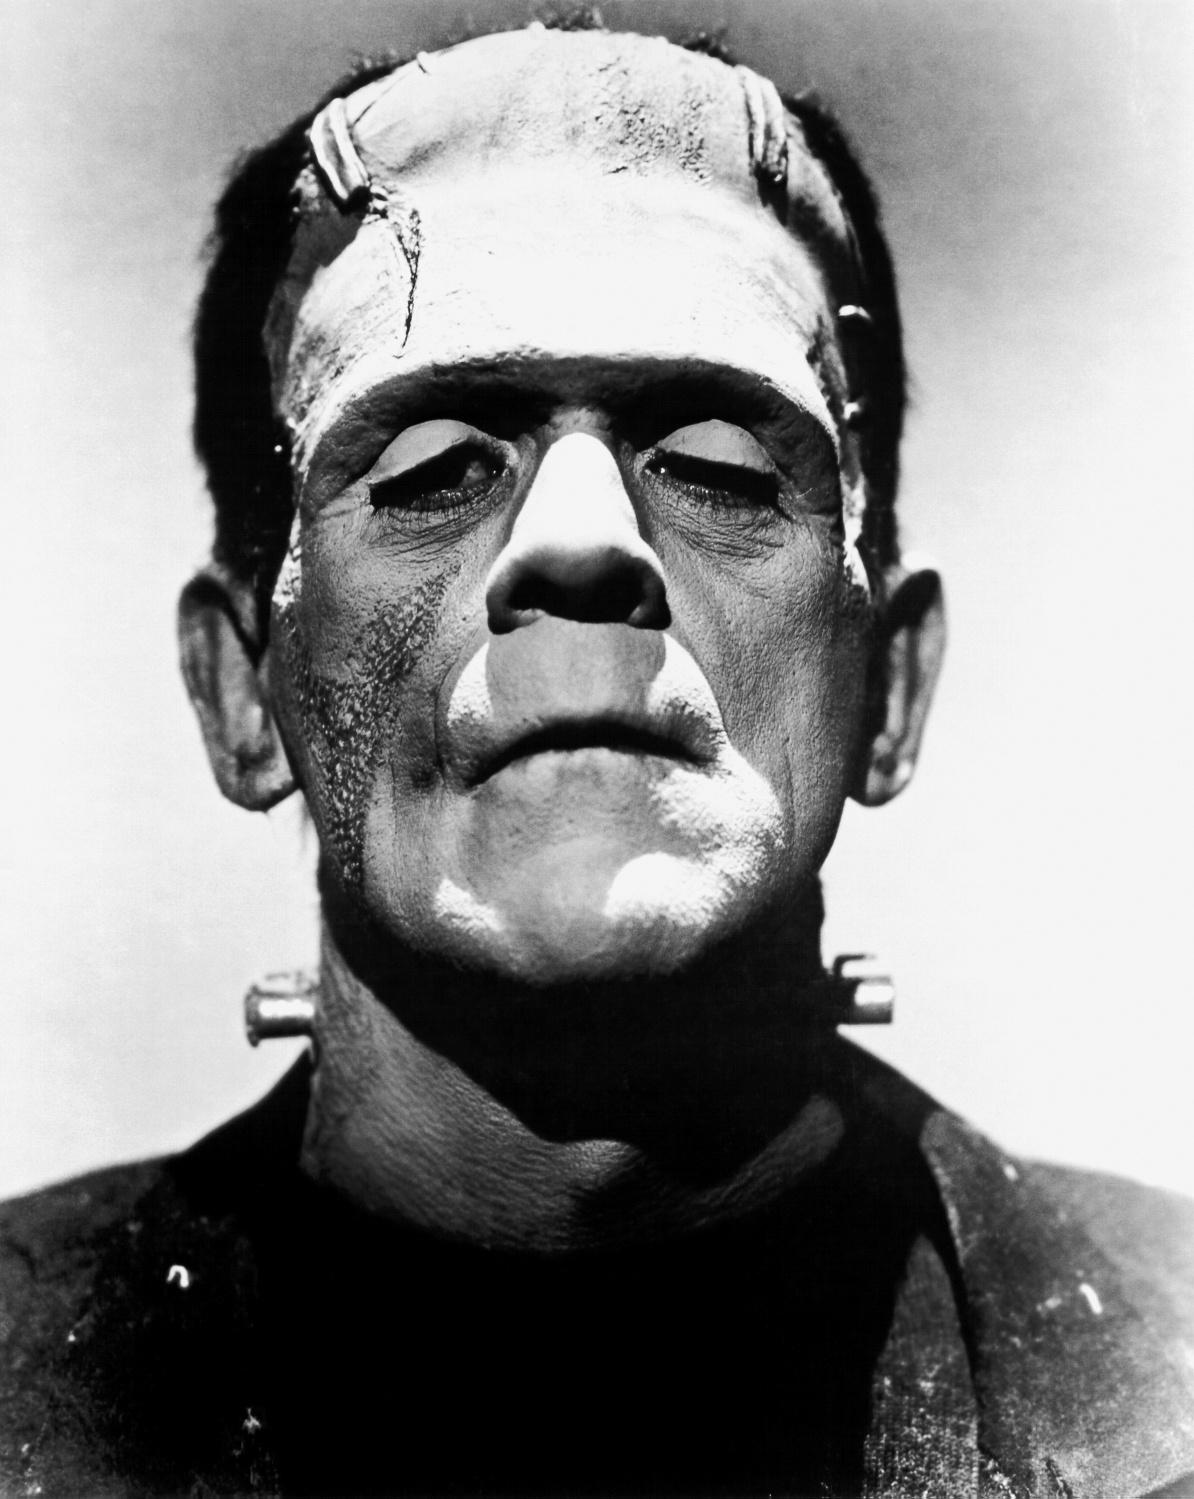 A promotional photo of Boris Karloff as Frankenstein's monster.